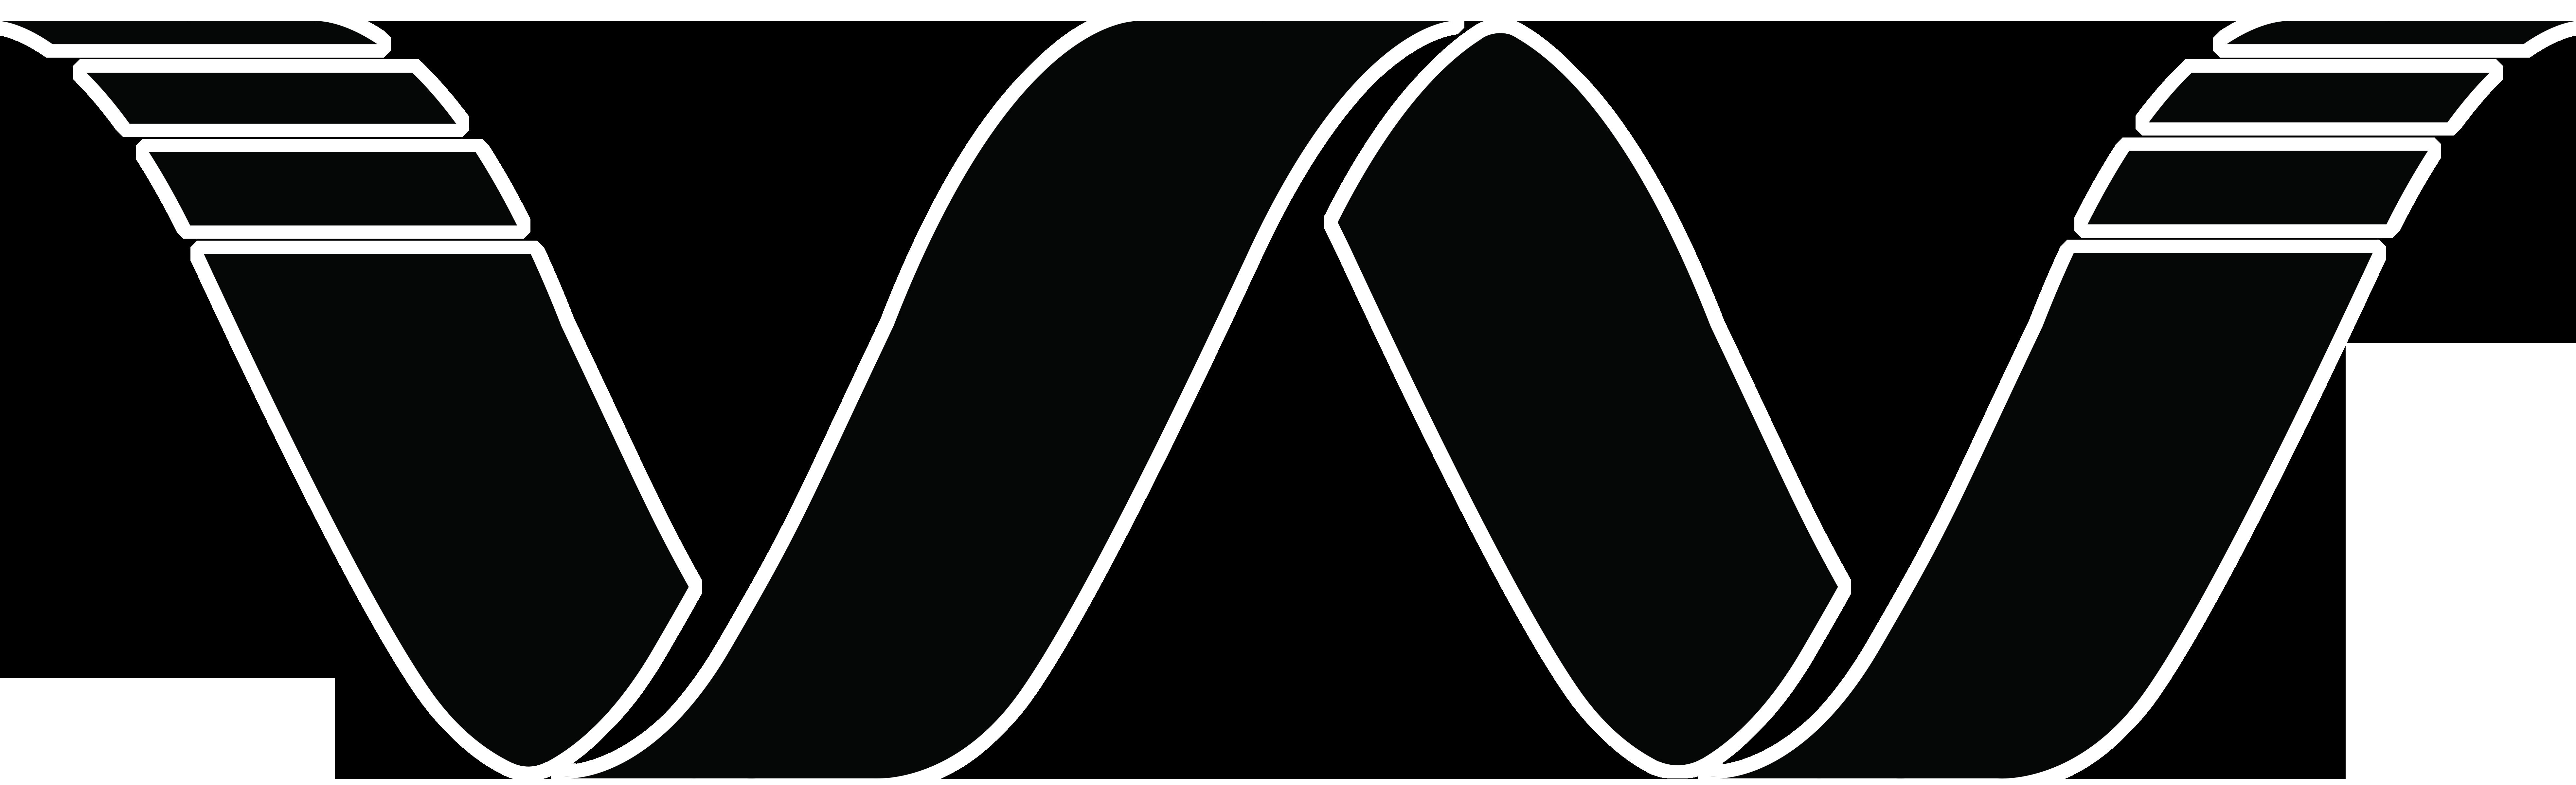 wi-logo-bw-whiteborder